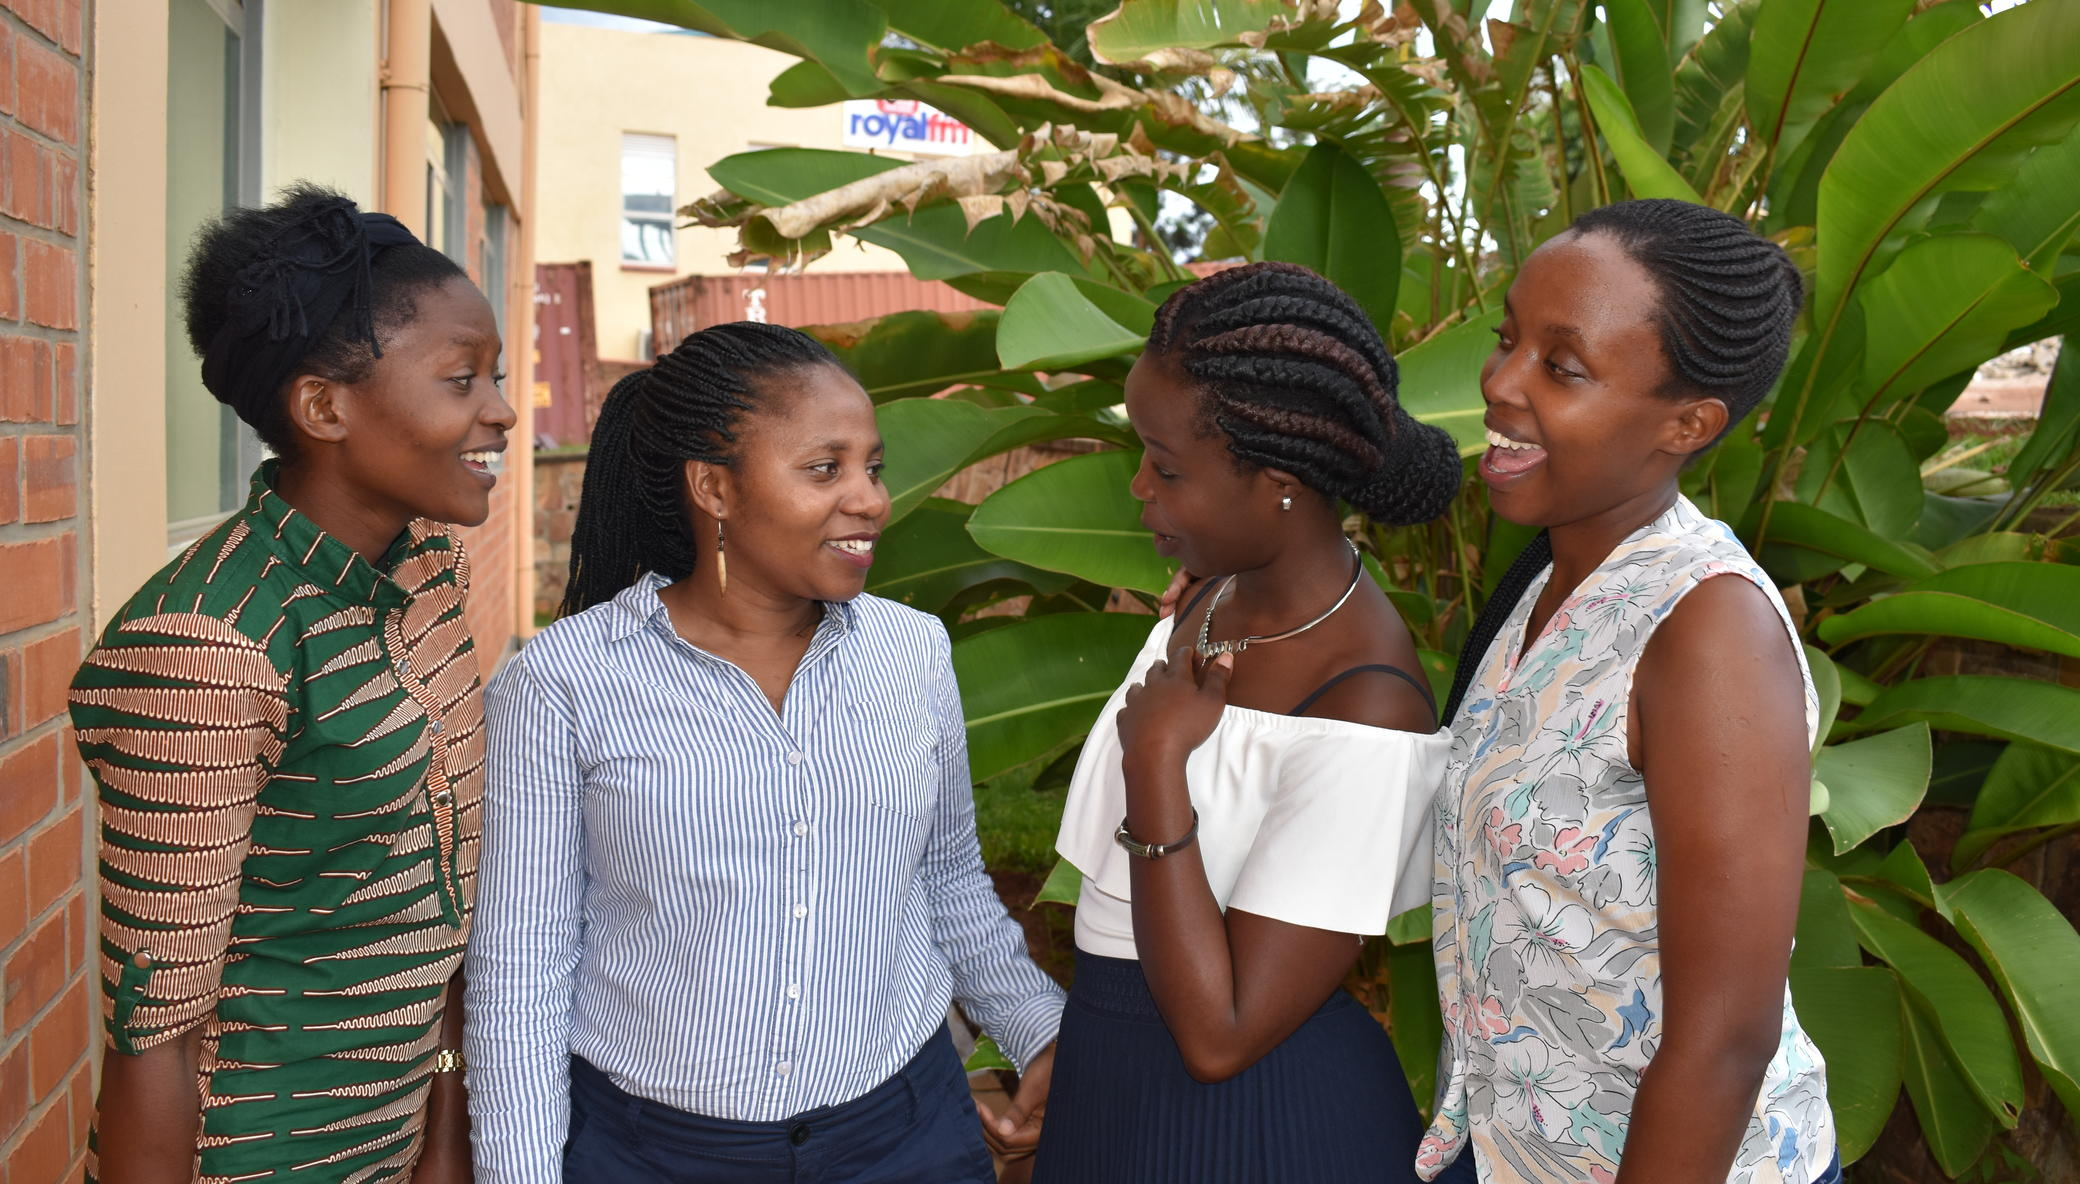 Empower women in Africa through higher education!